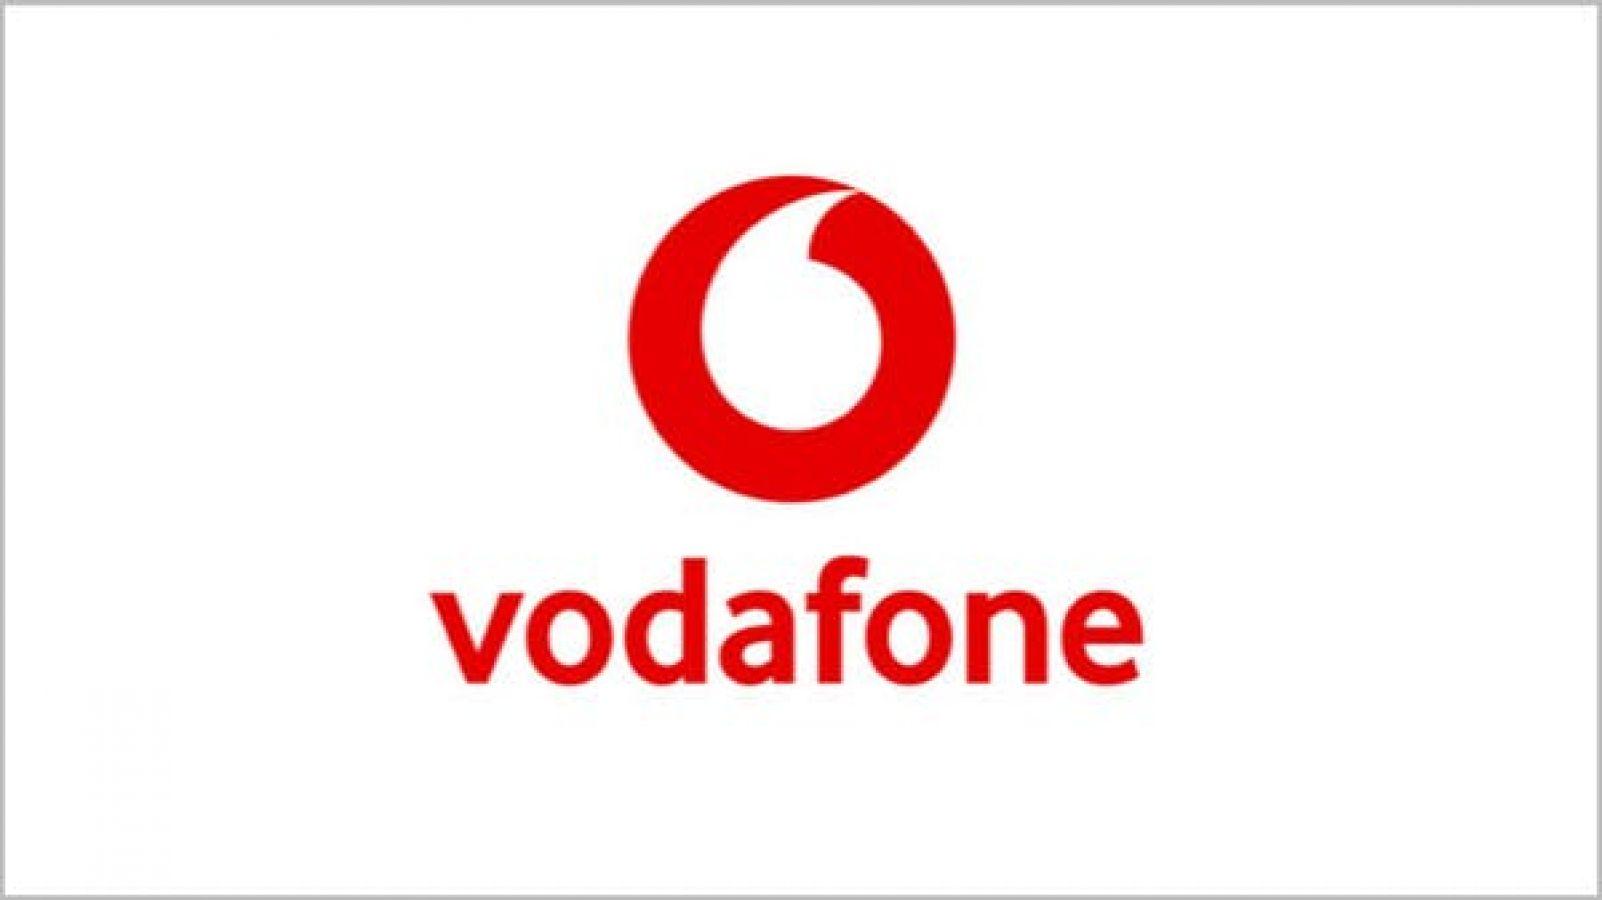 Vodafone रिचार्ज प्लान पर उठाये 16,000 रु का फायदा, पढ़े डिटेल्स